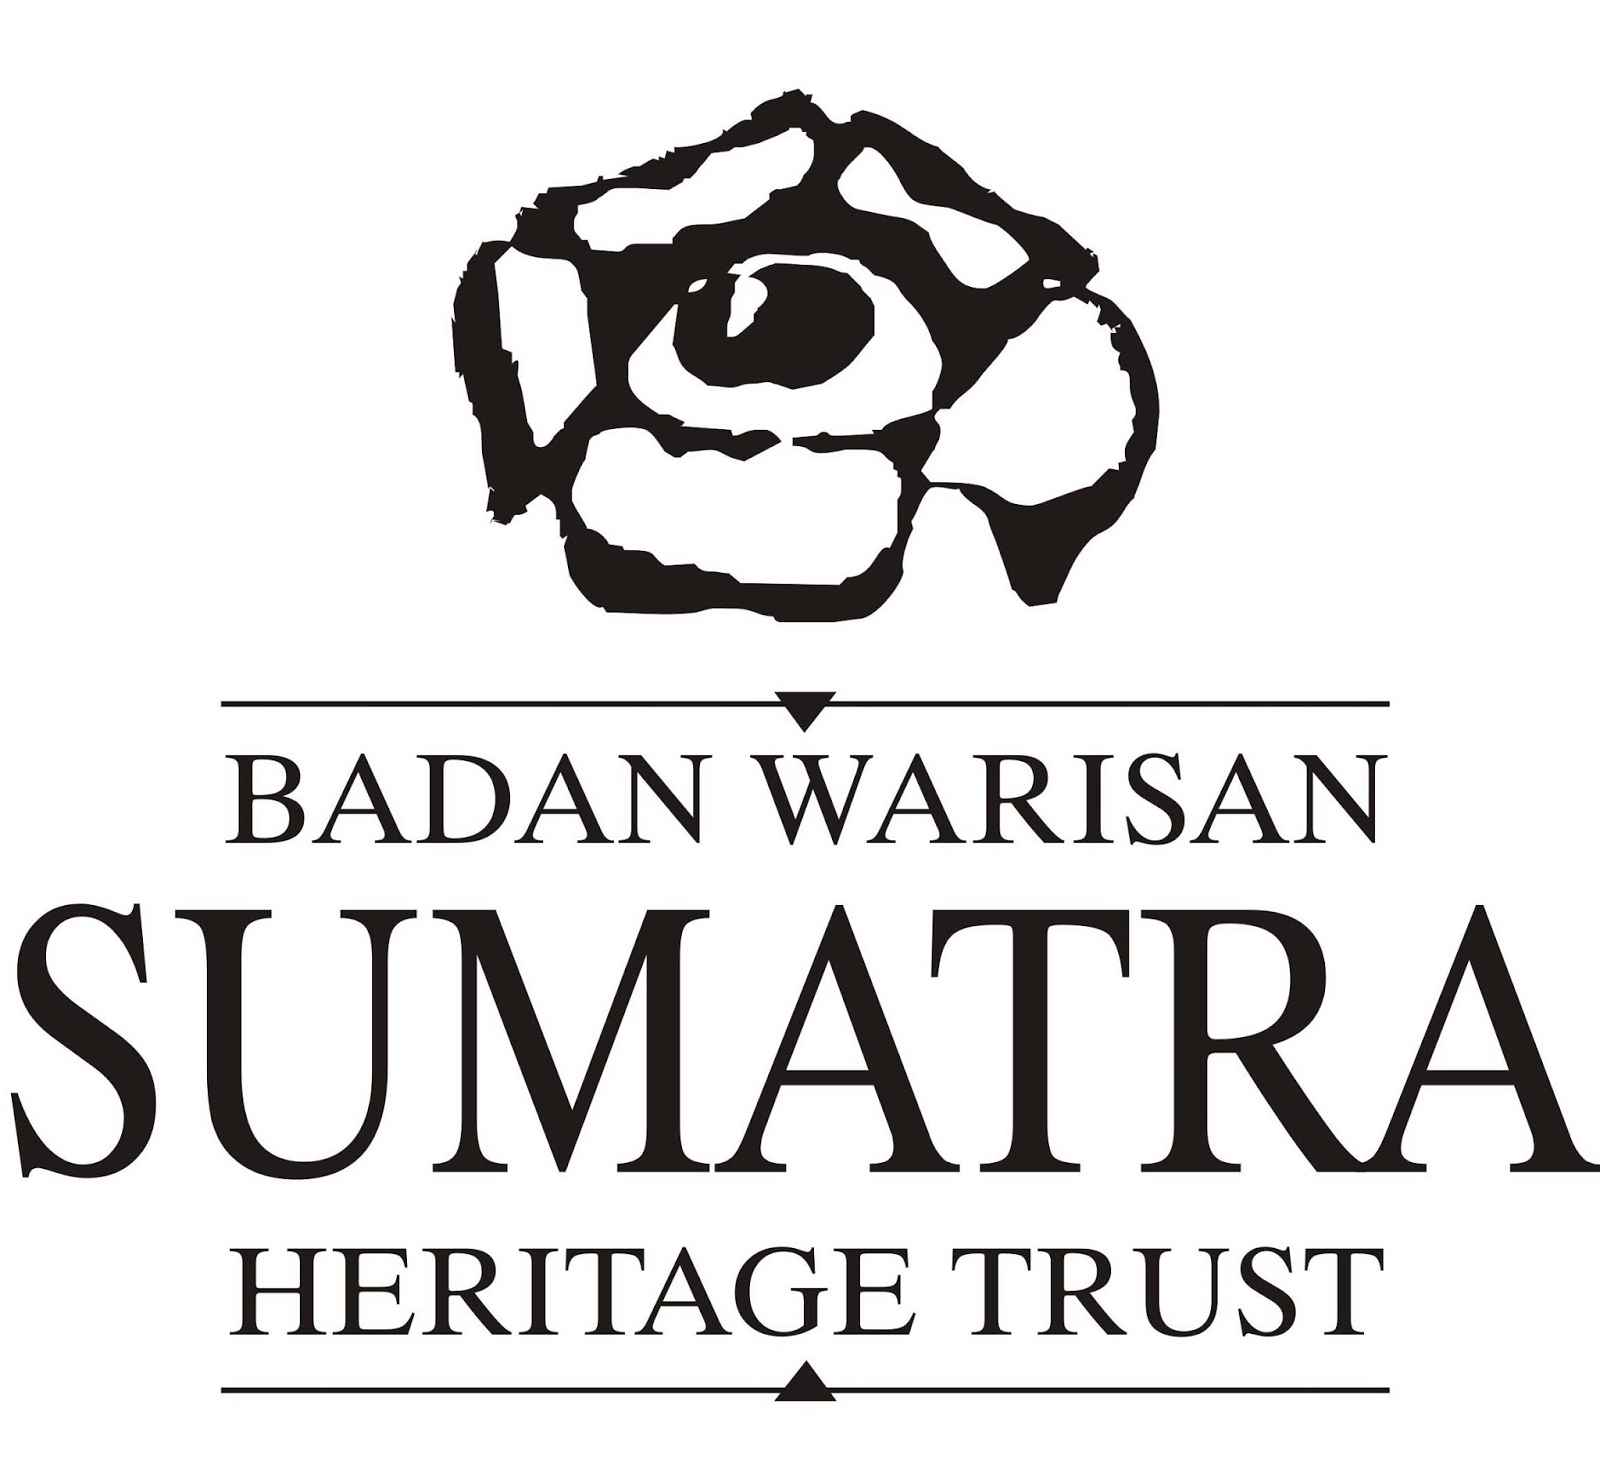 Badan Warisan Sumatra